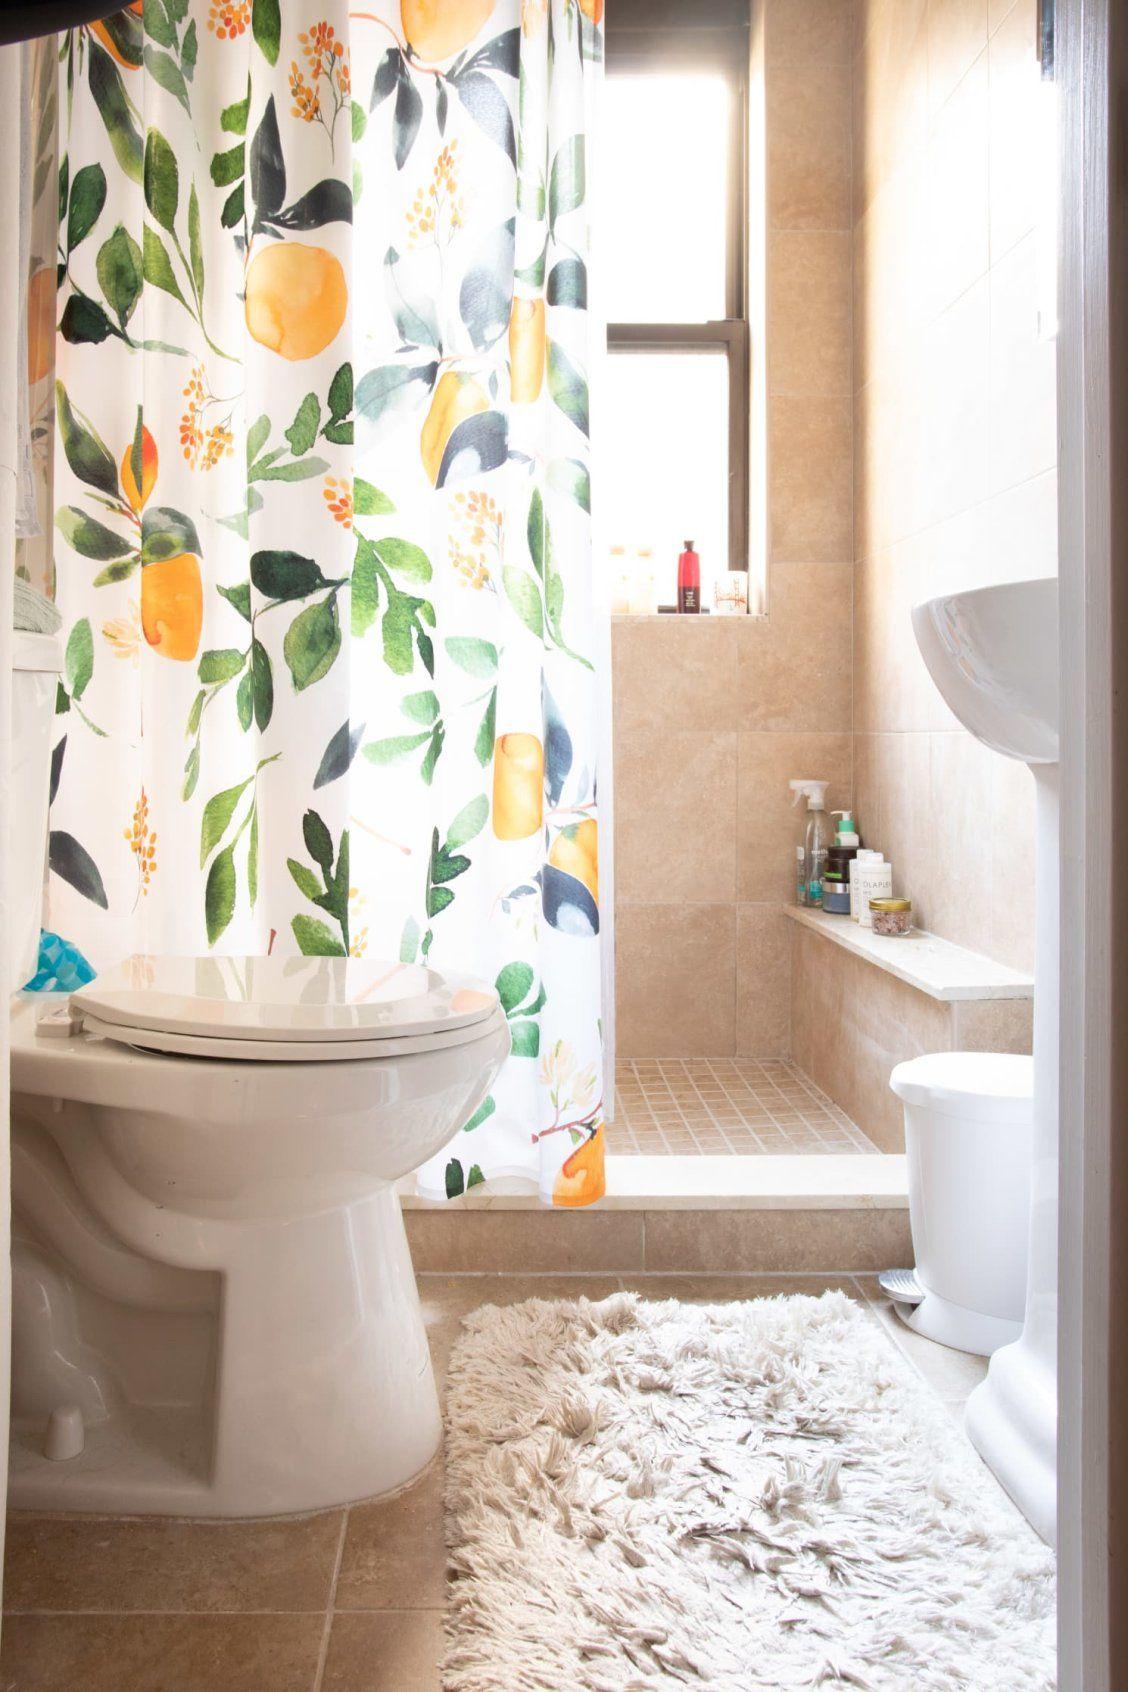 Roommates Decorated This Apartment With Lots Of Craigslist And Facebook Marketplace Scores Rustic Bathroom Decor Diy Bathroom Decor Modern Bathroom Decor